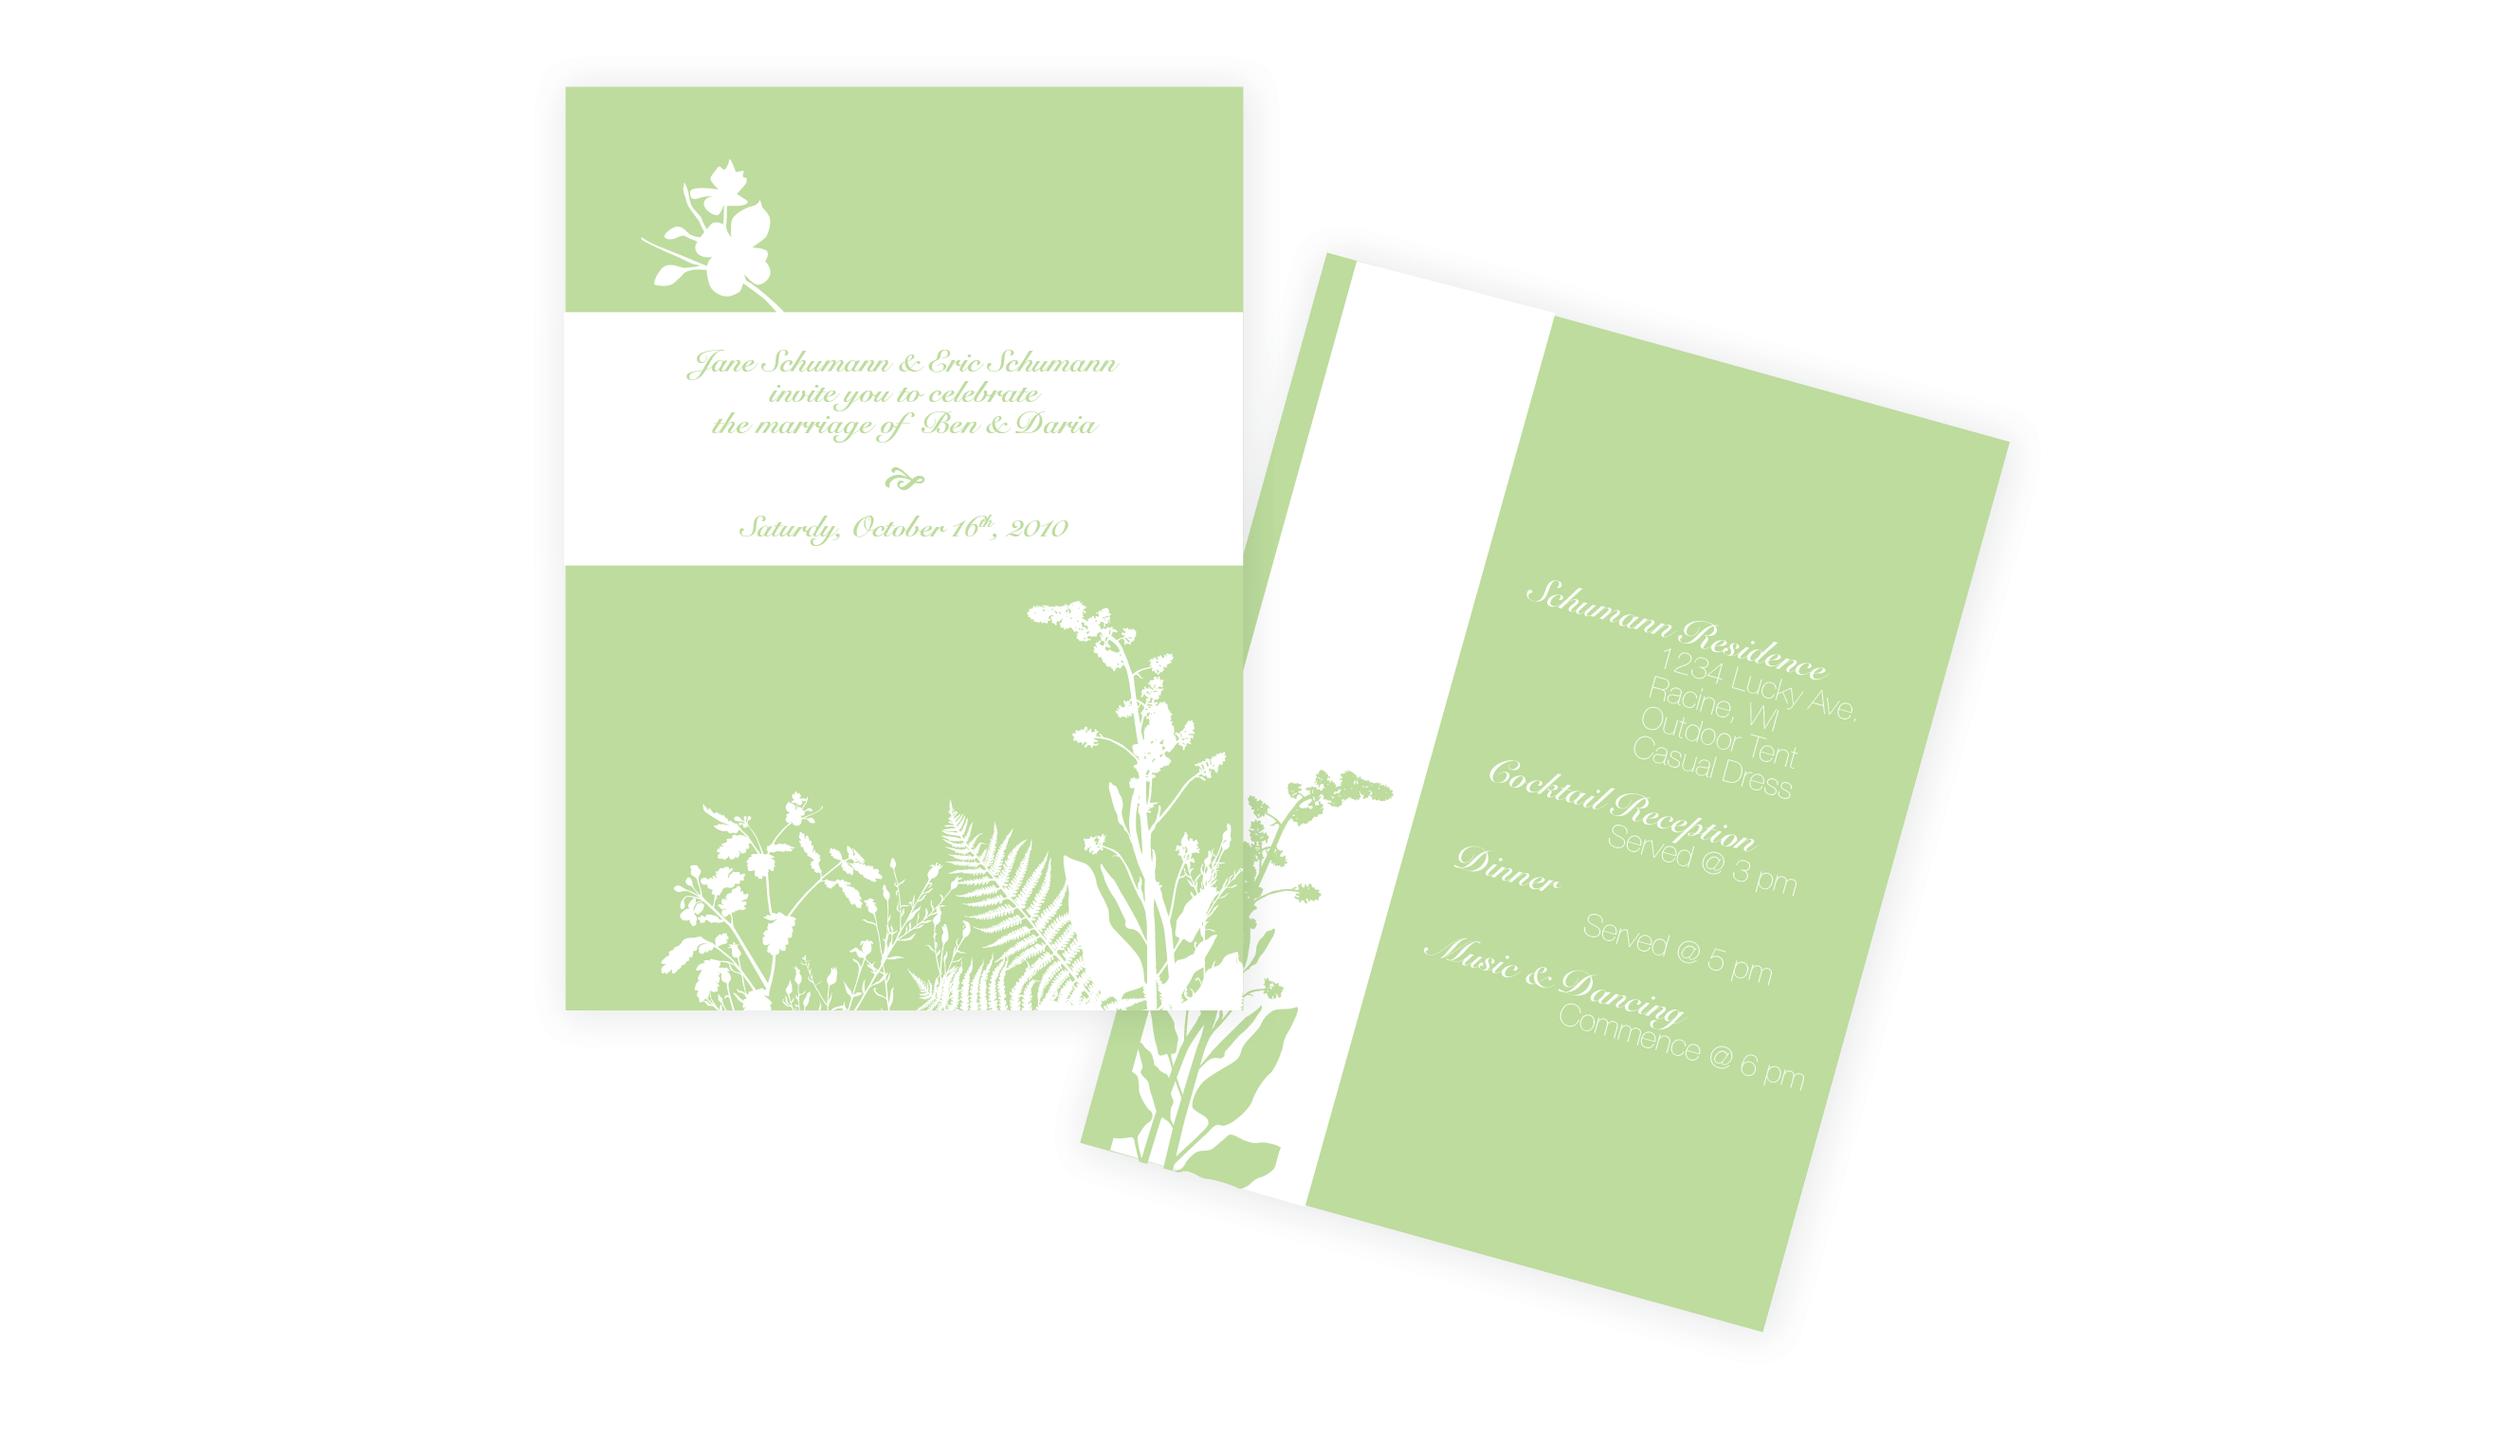 SchumannStudioCreative_WeddingInvitations_19.png